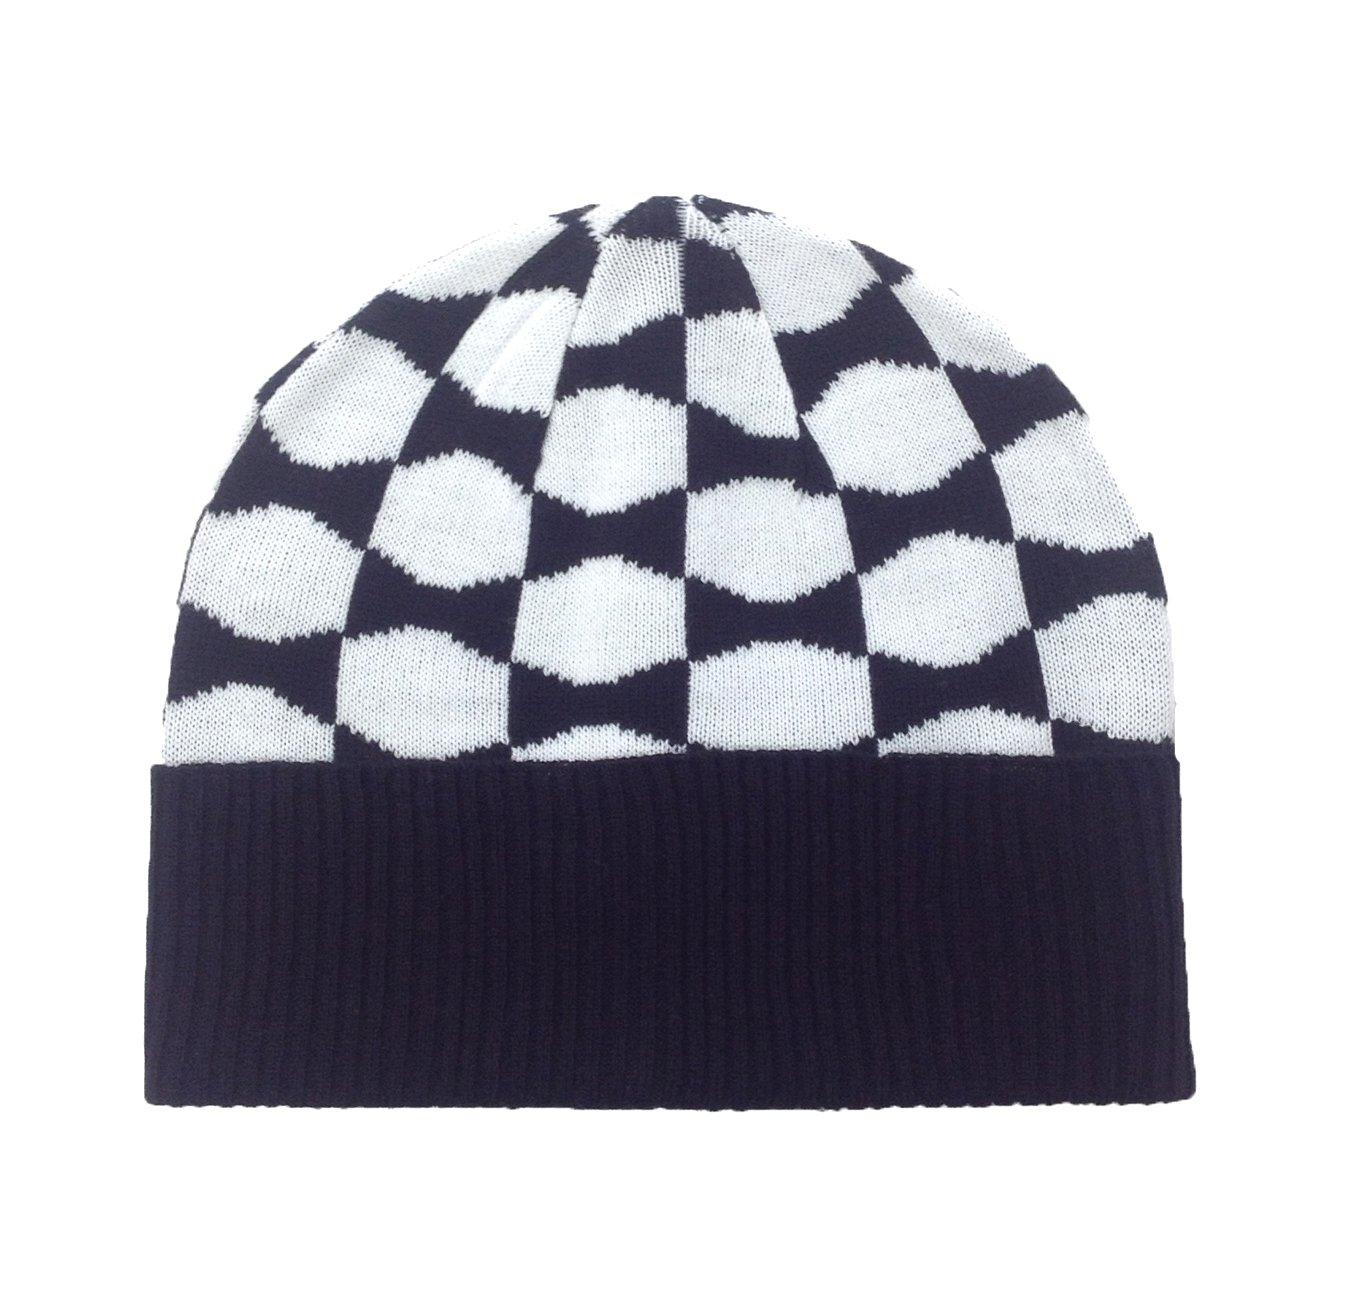 Kate Spade Women's Signature Bow Knit Beanie Hat, Black / Cream